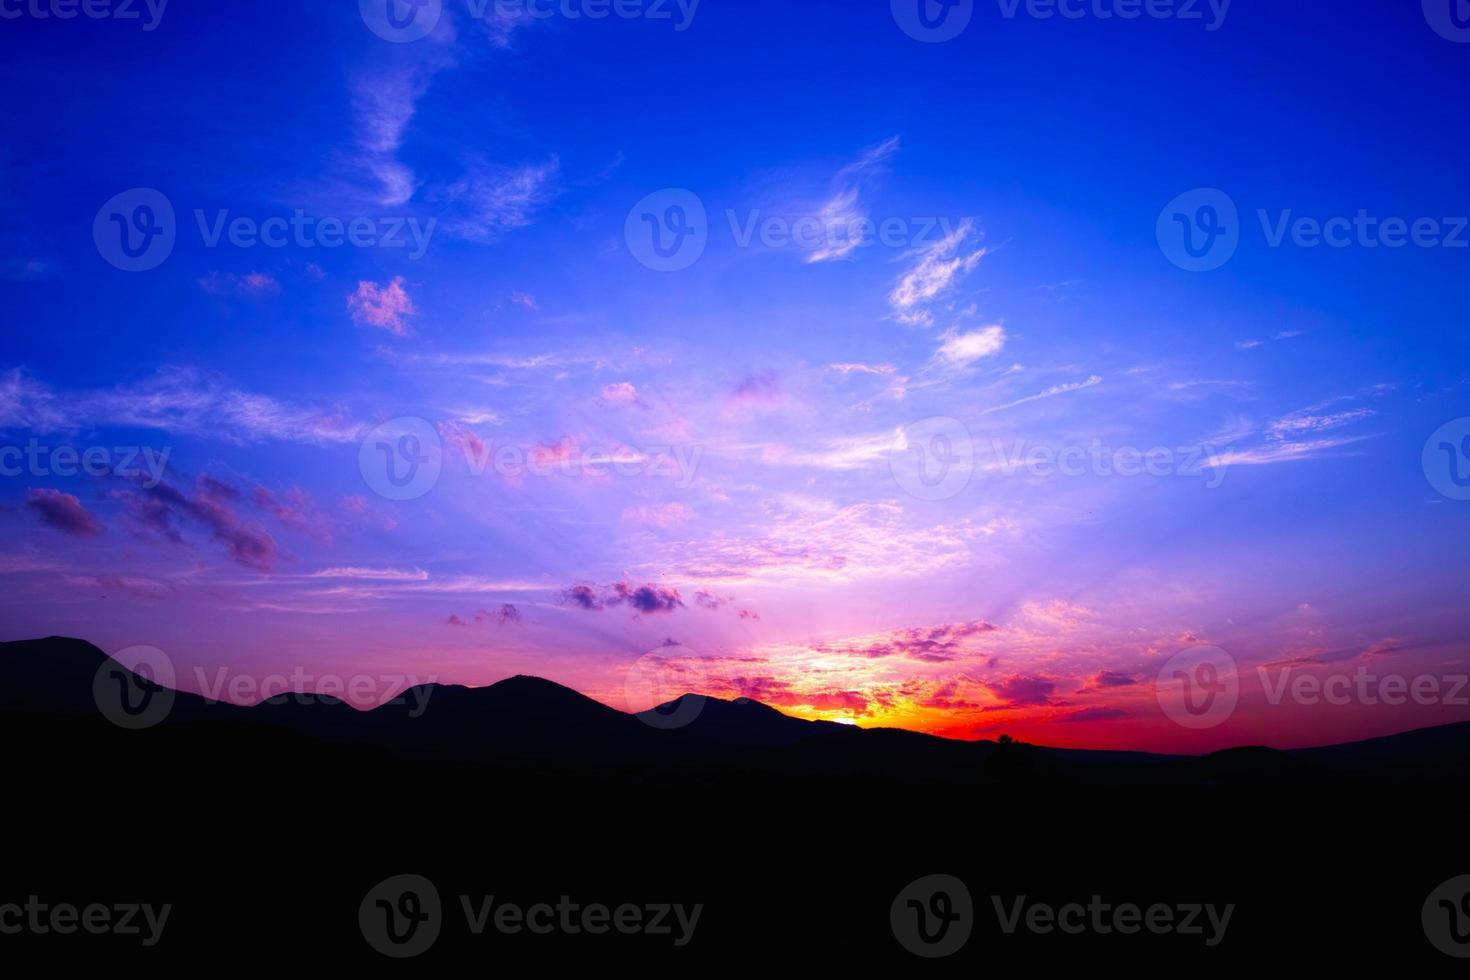 Tsumagoimura of sunset photo